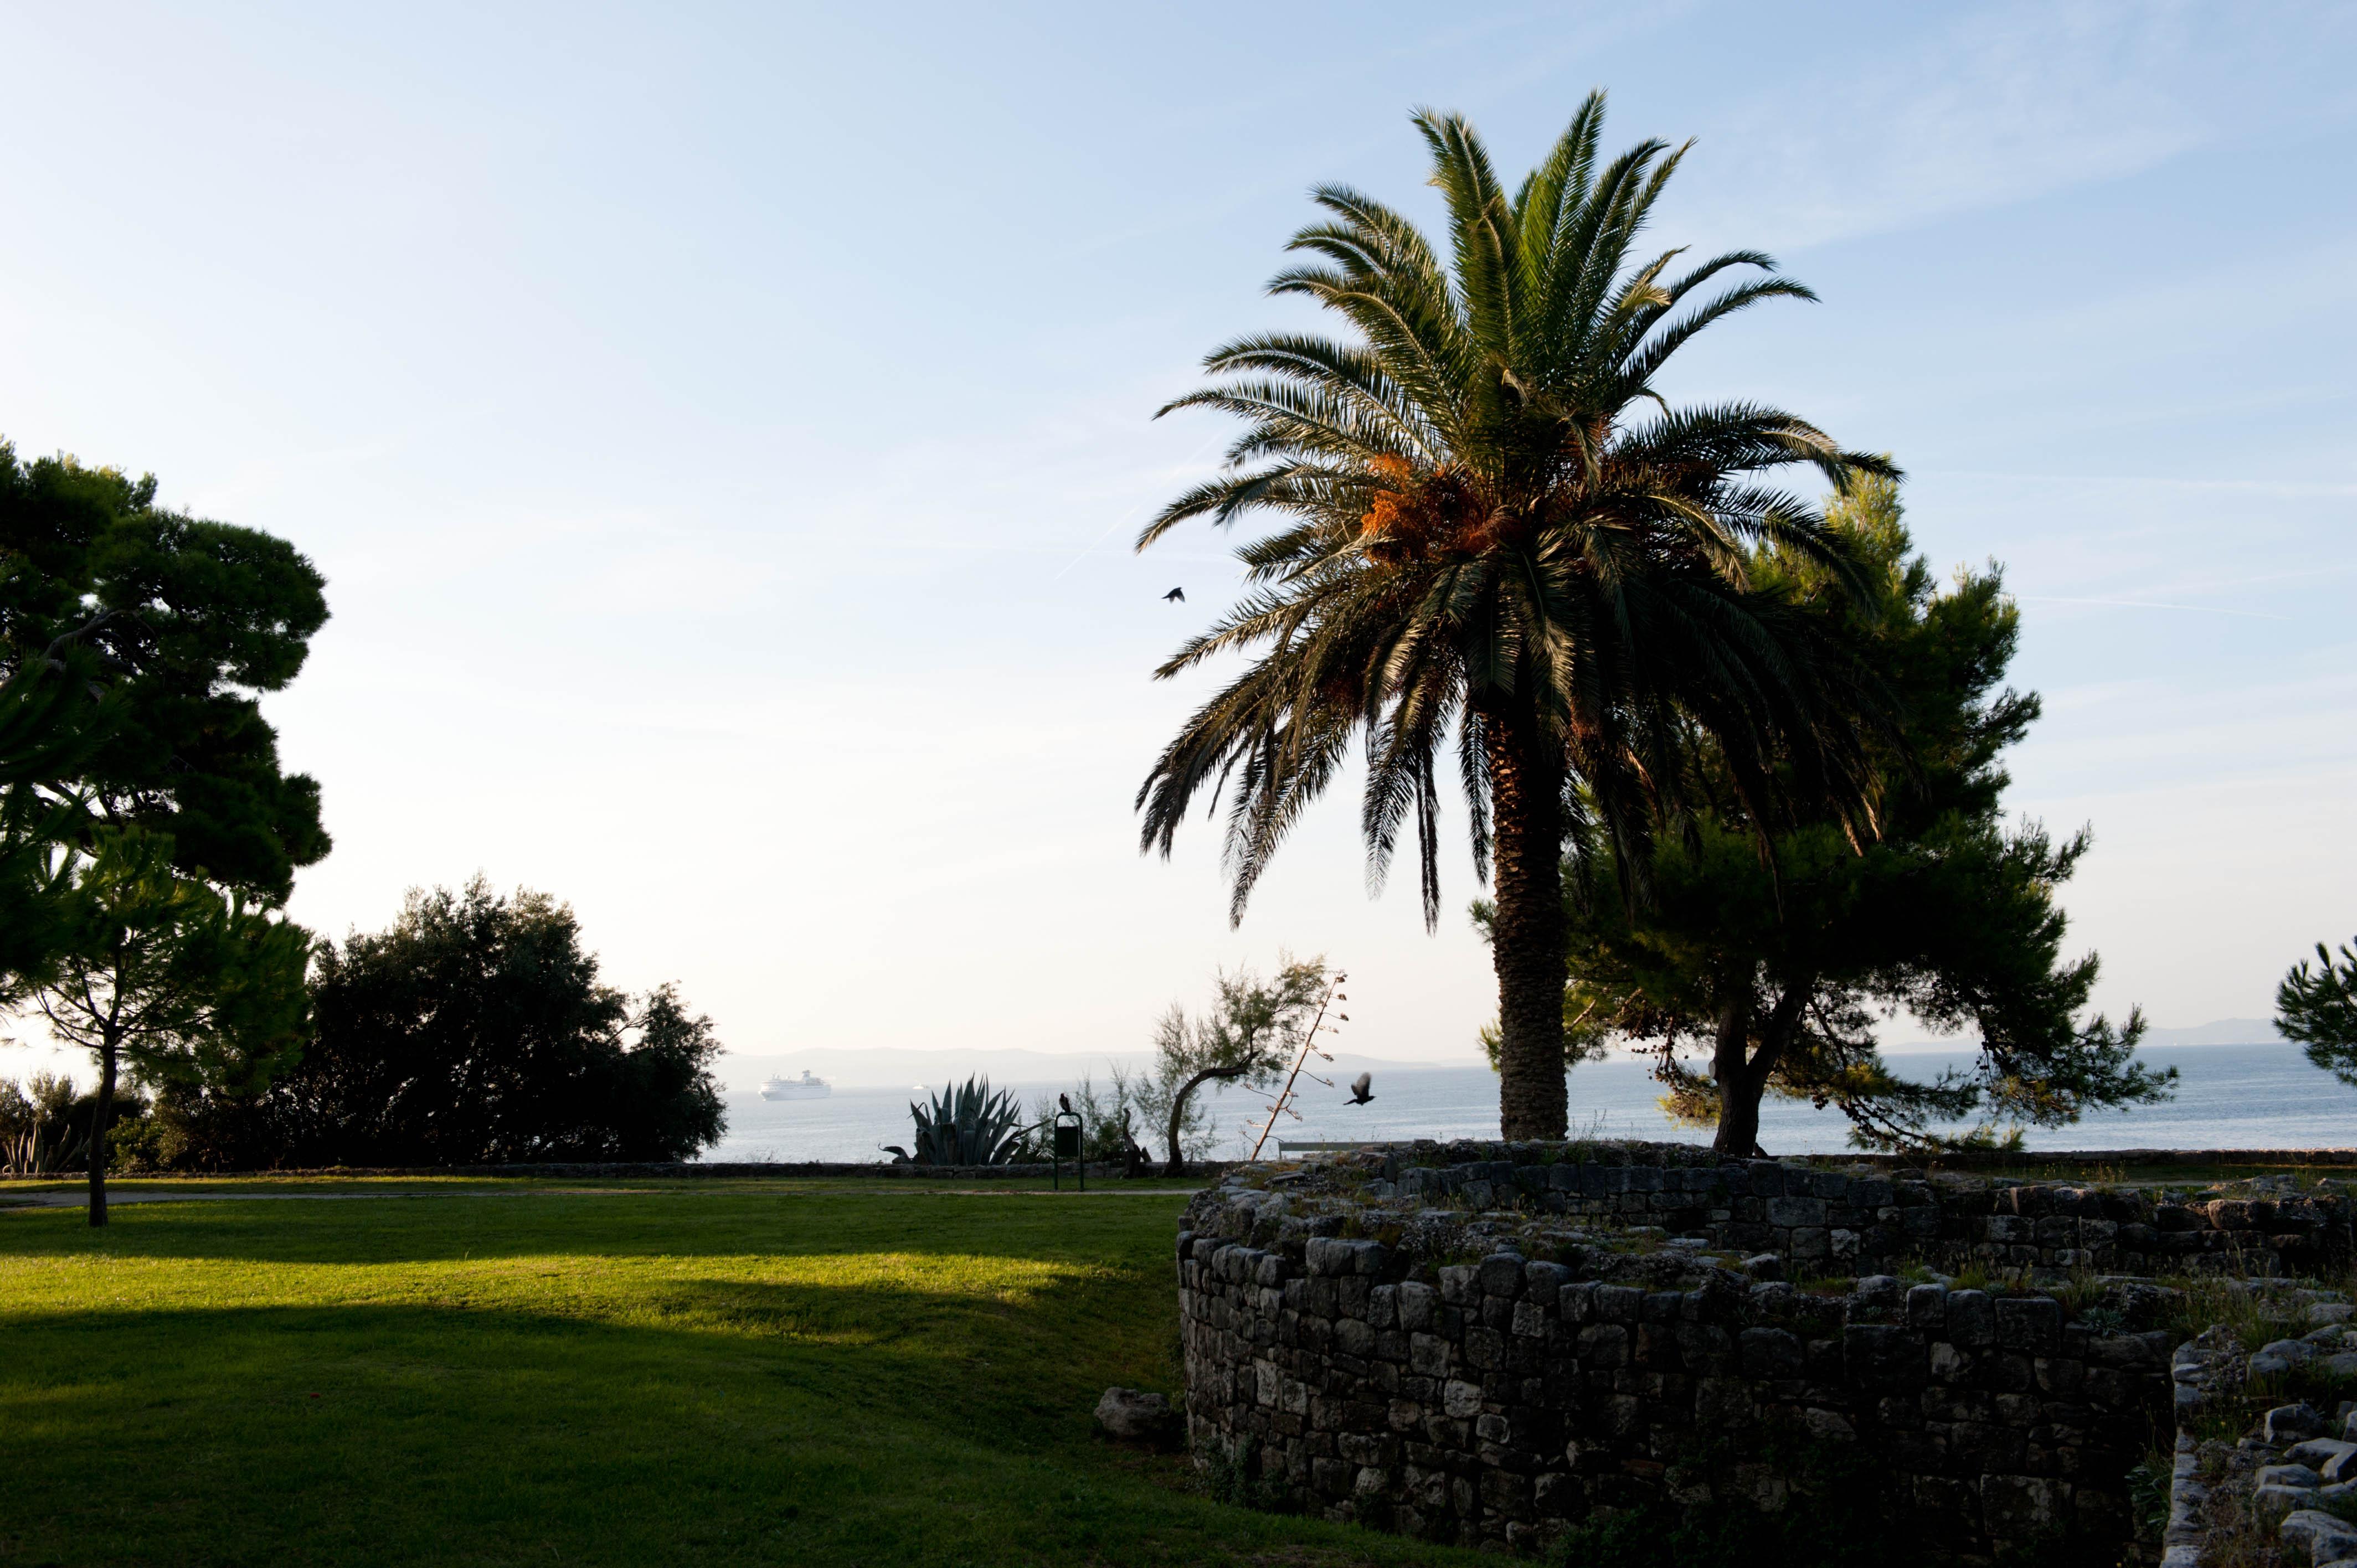 0352-Split - Jadran (Dalmatie centrale)